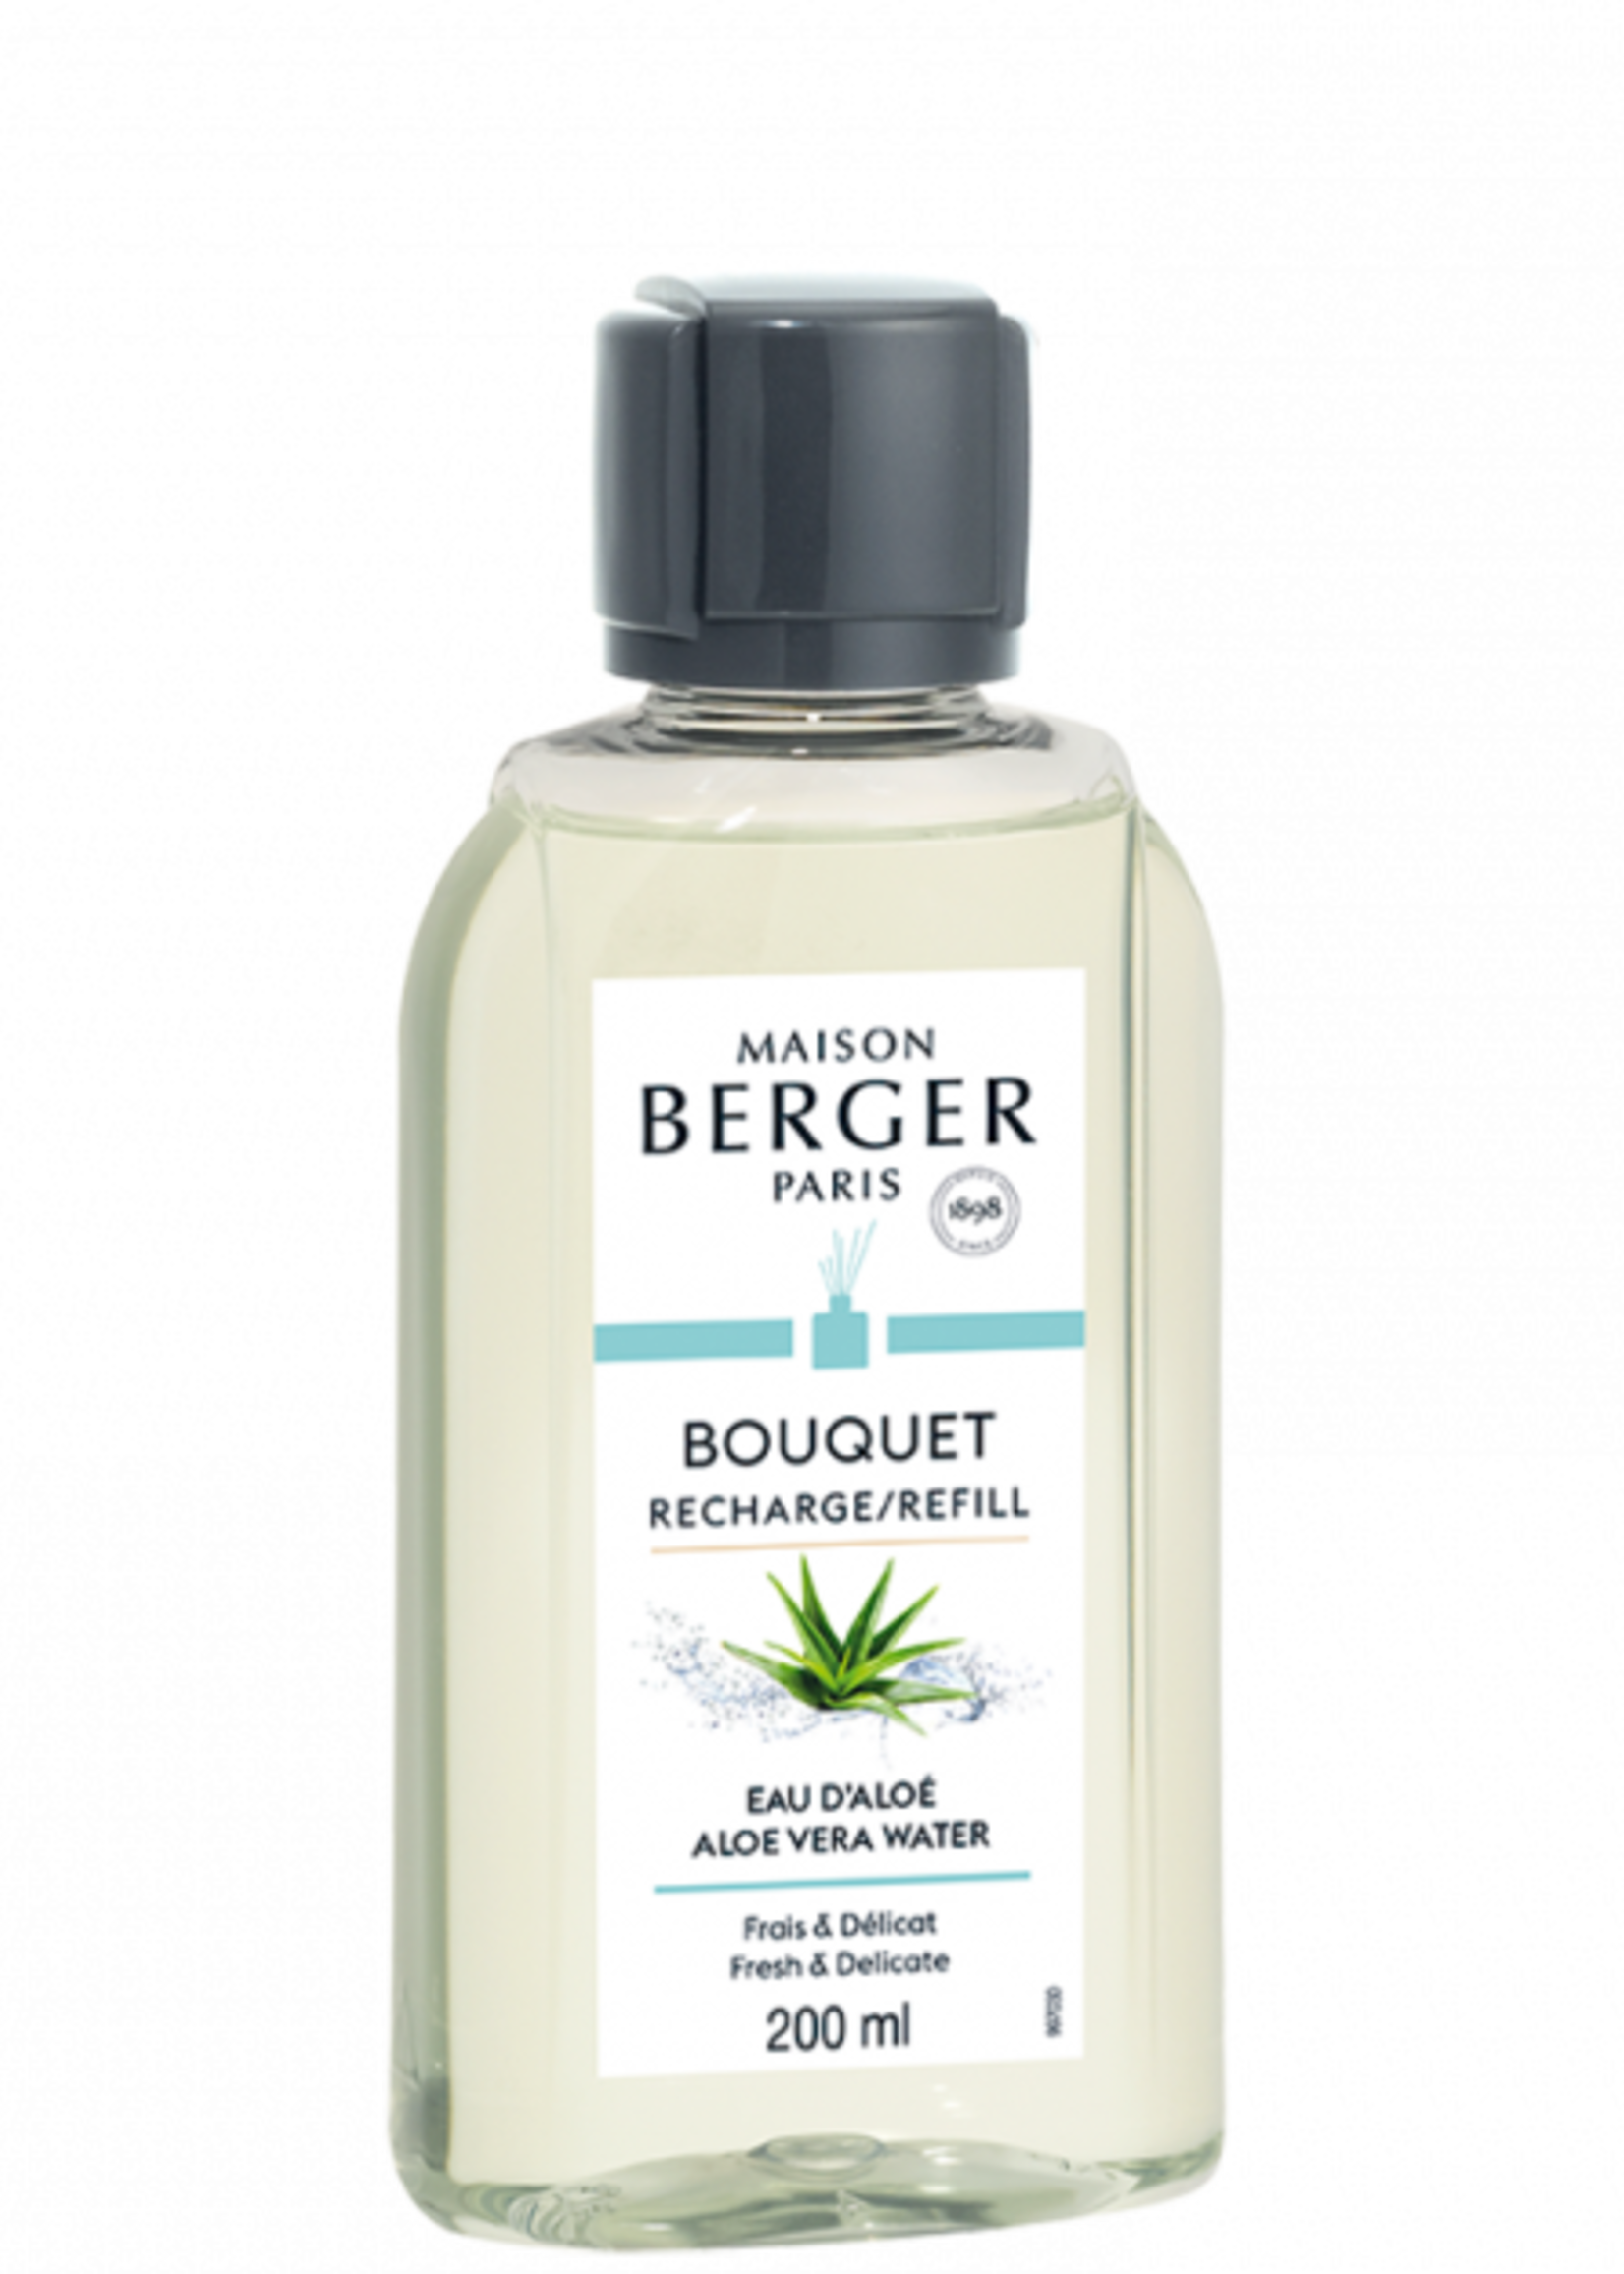 Parfum de Berger Navulling Parfumverspreider Eau d'Aloé